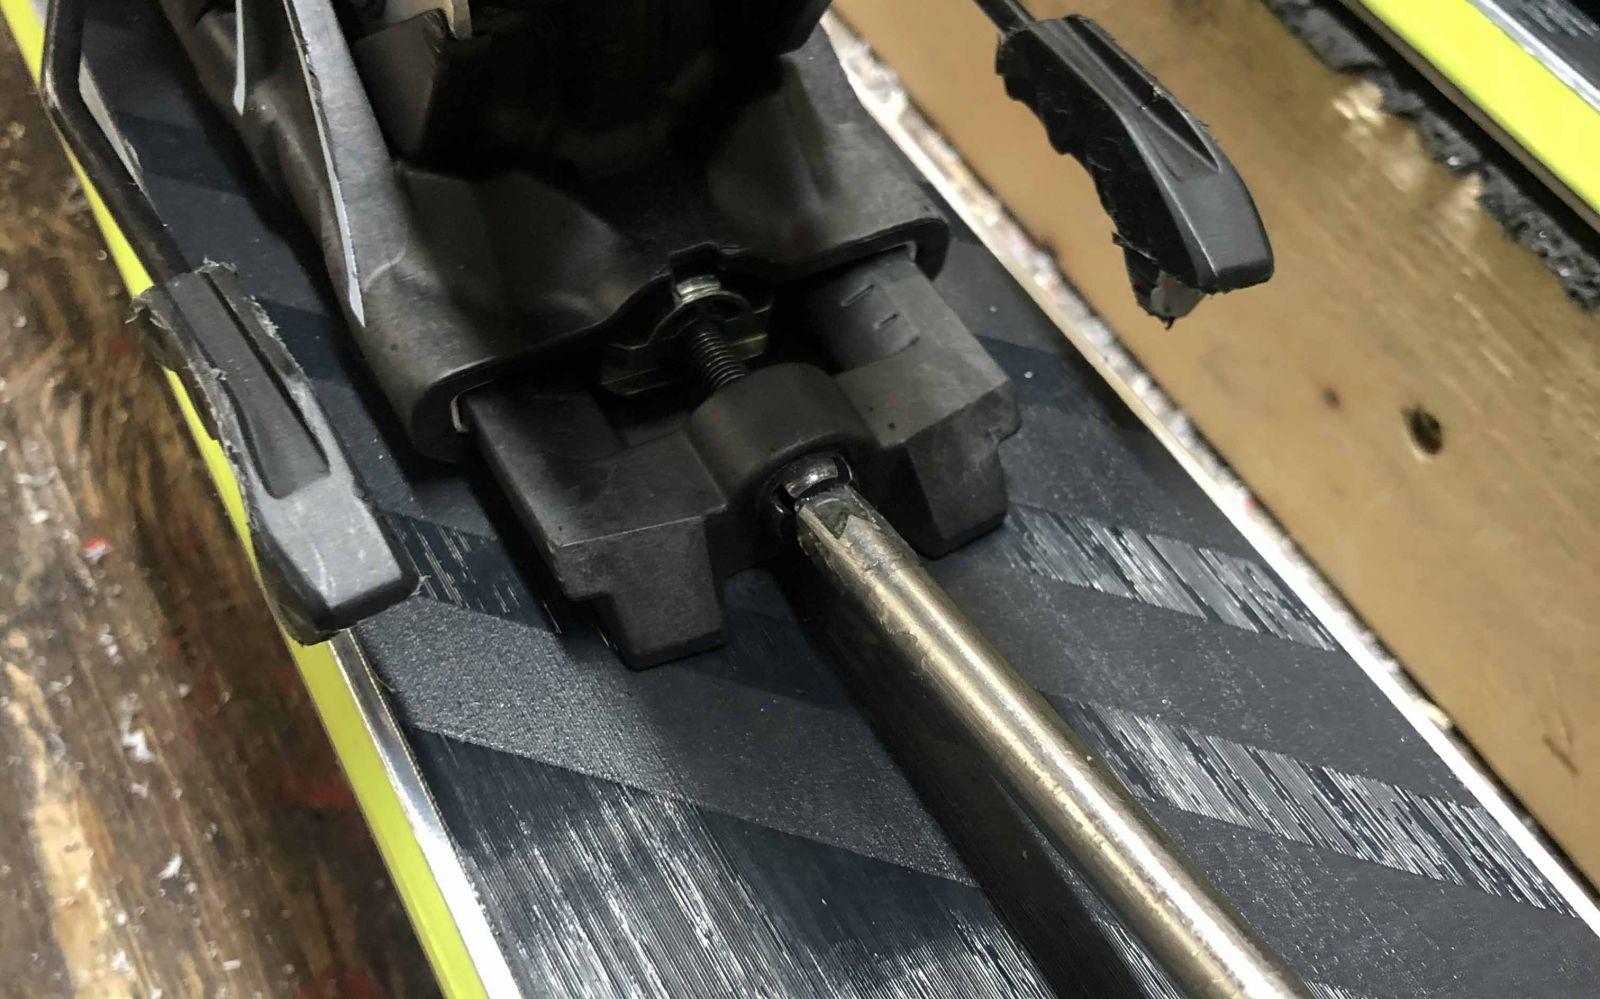 Salomon Shift Forward Pressure Adjustment Screw